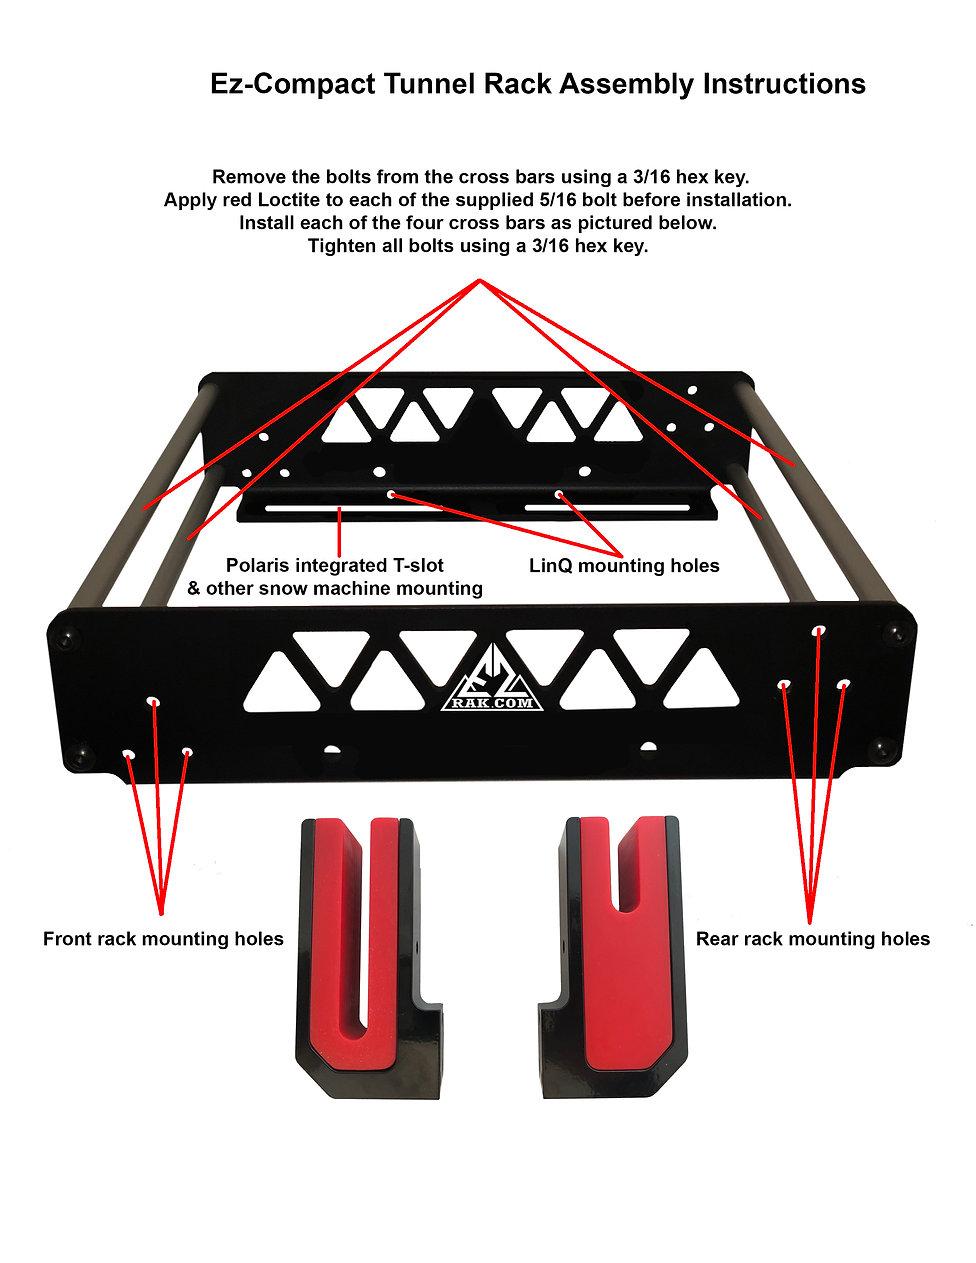 Ez-Compact Rack Assembly.jpg